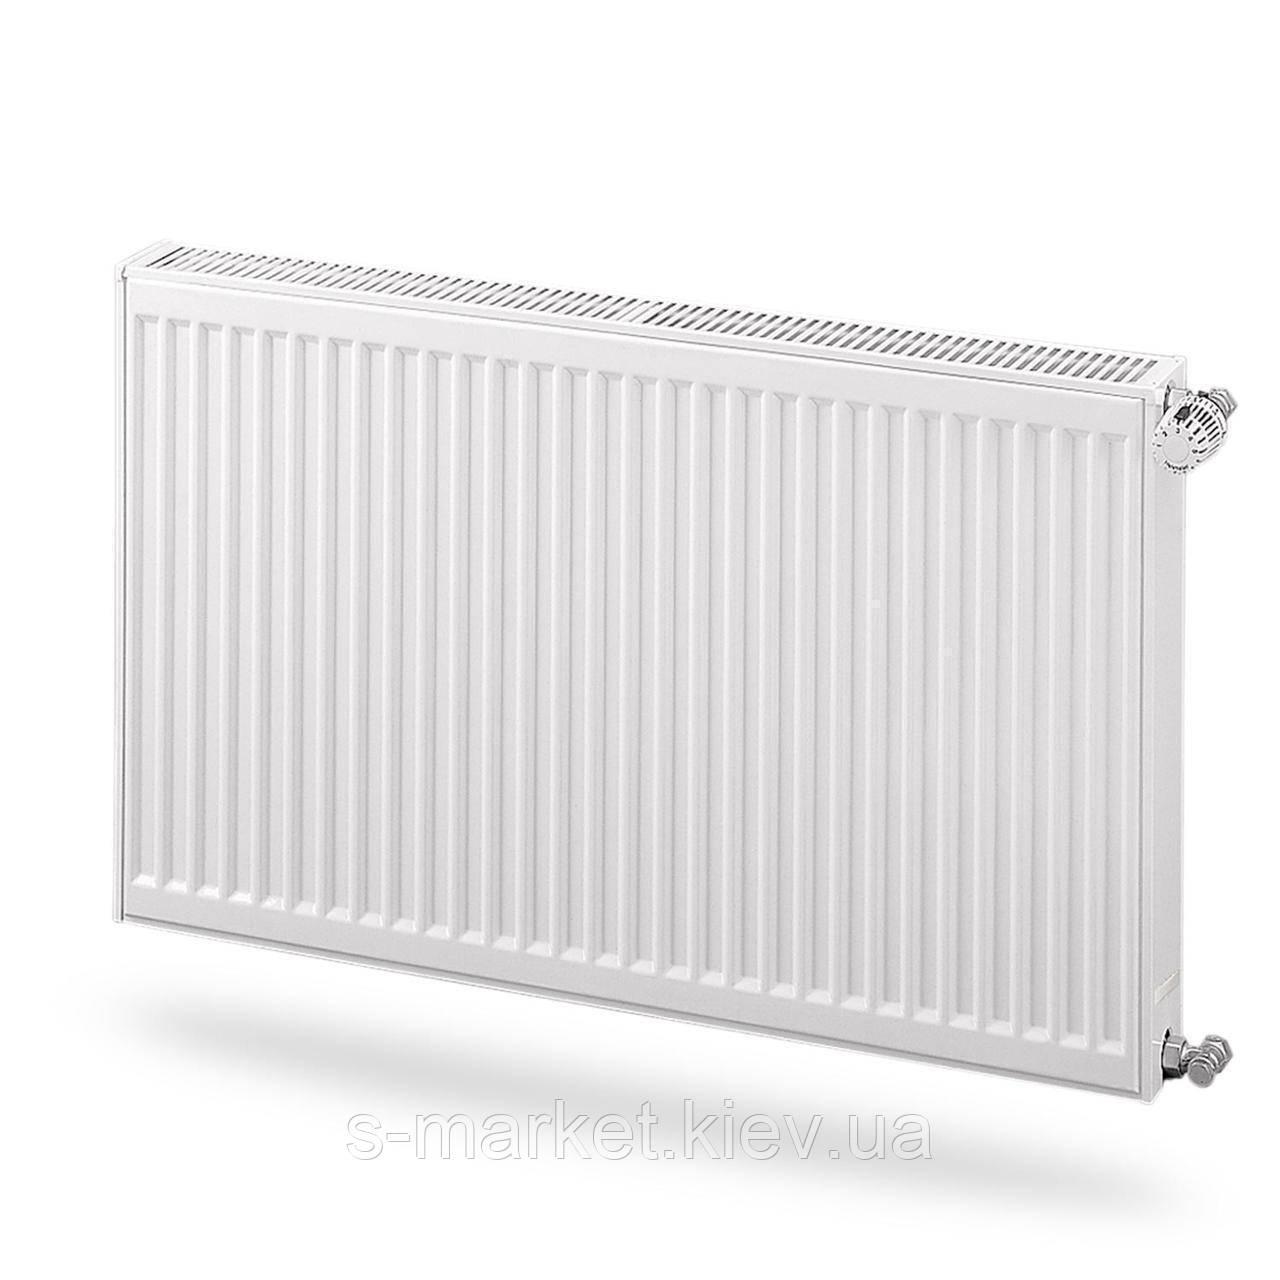 Радиатор Purmo Compact 11 тип 500х600